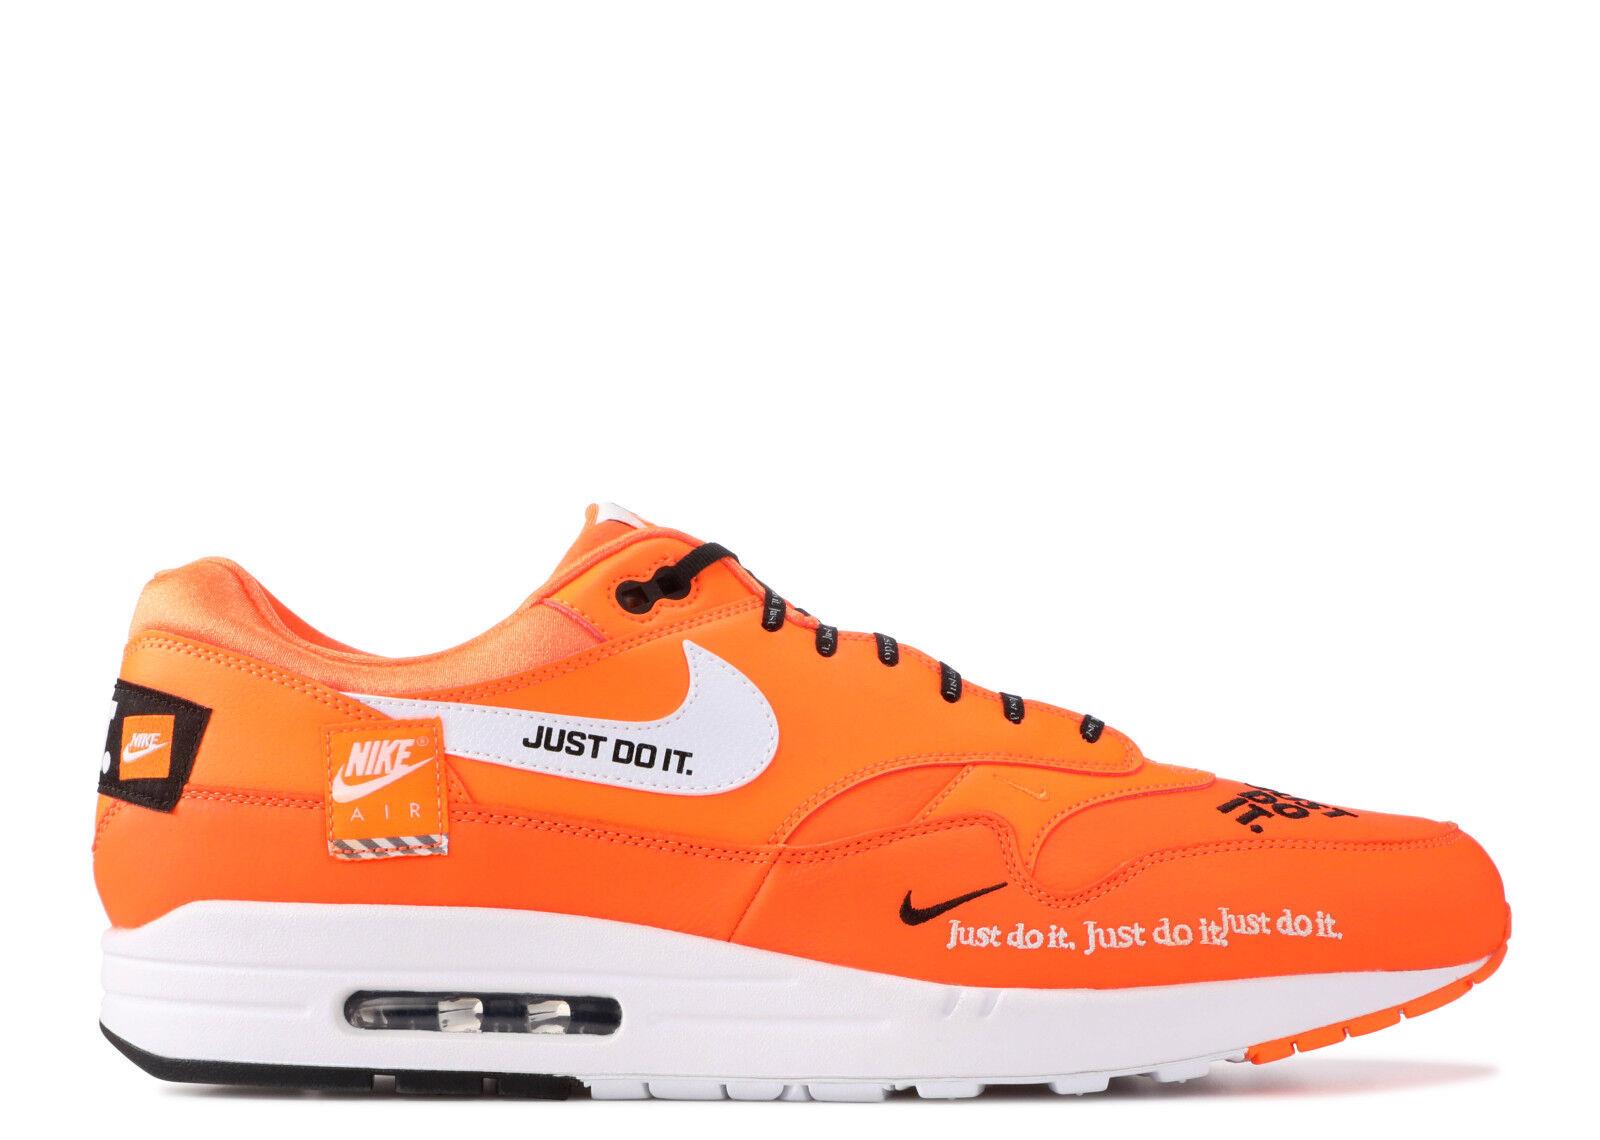 42ddd83e7c03f6 Brand Brand Brand New Nike Air Max 1 SE